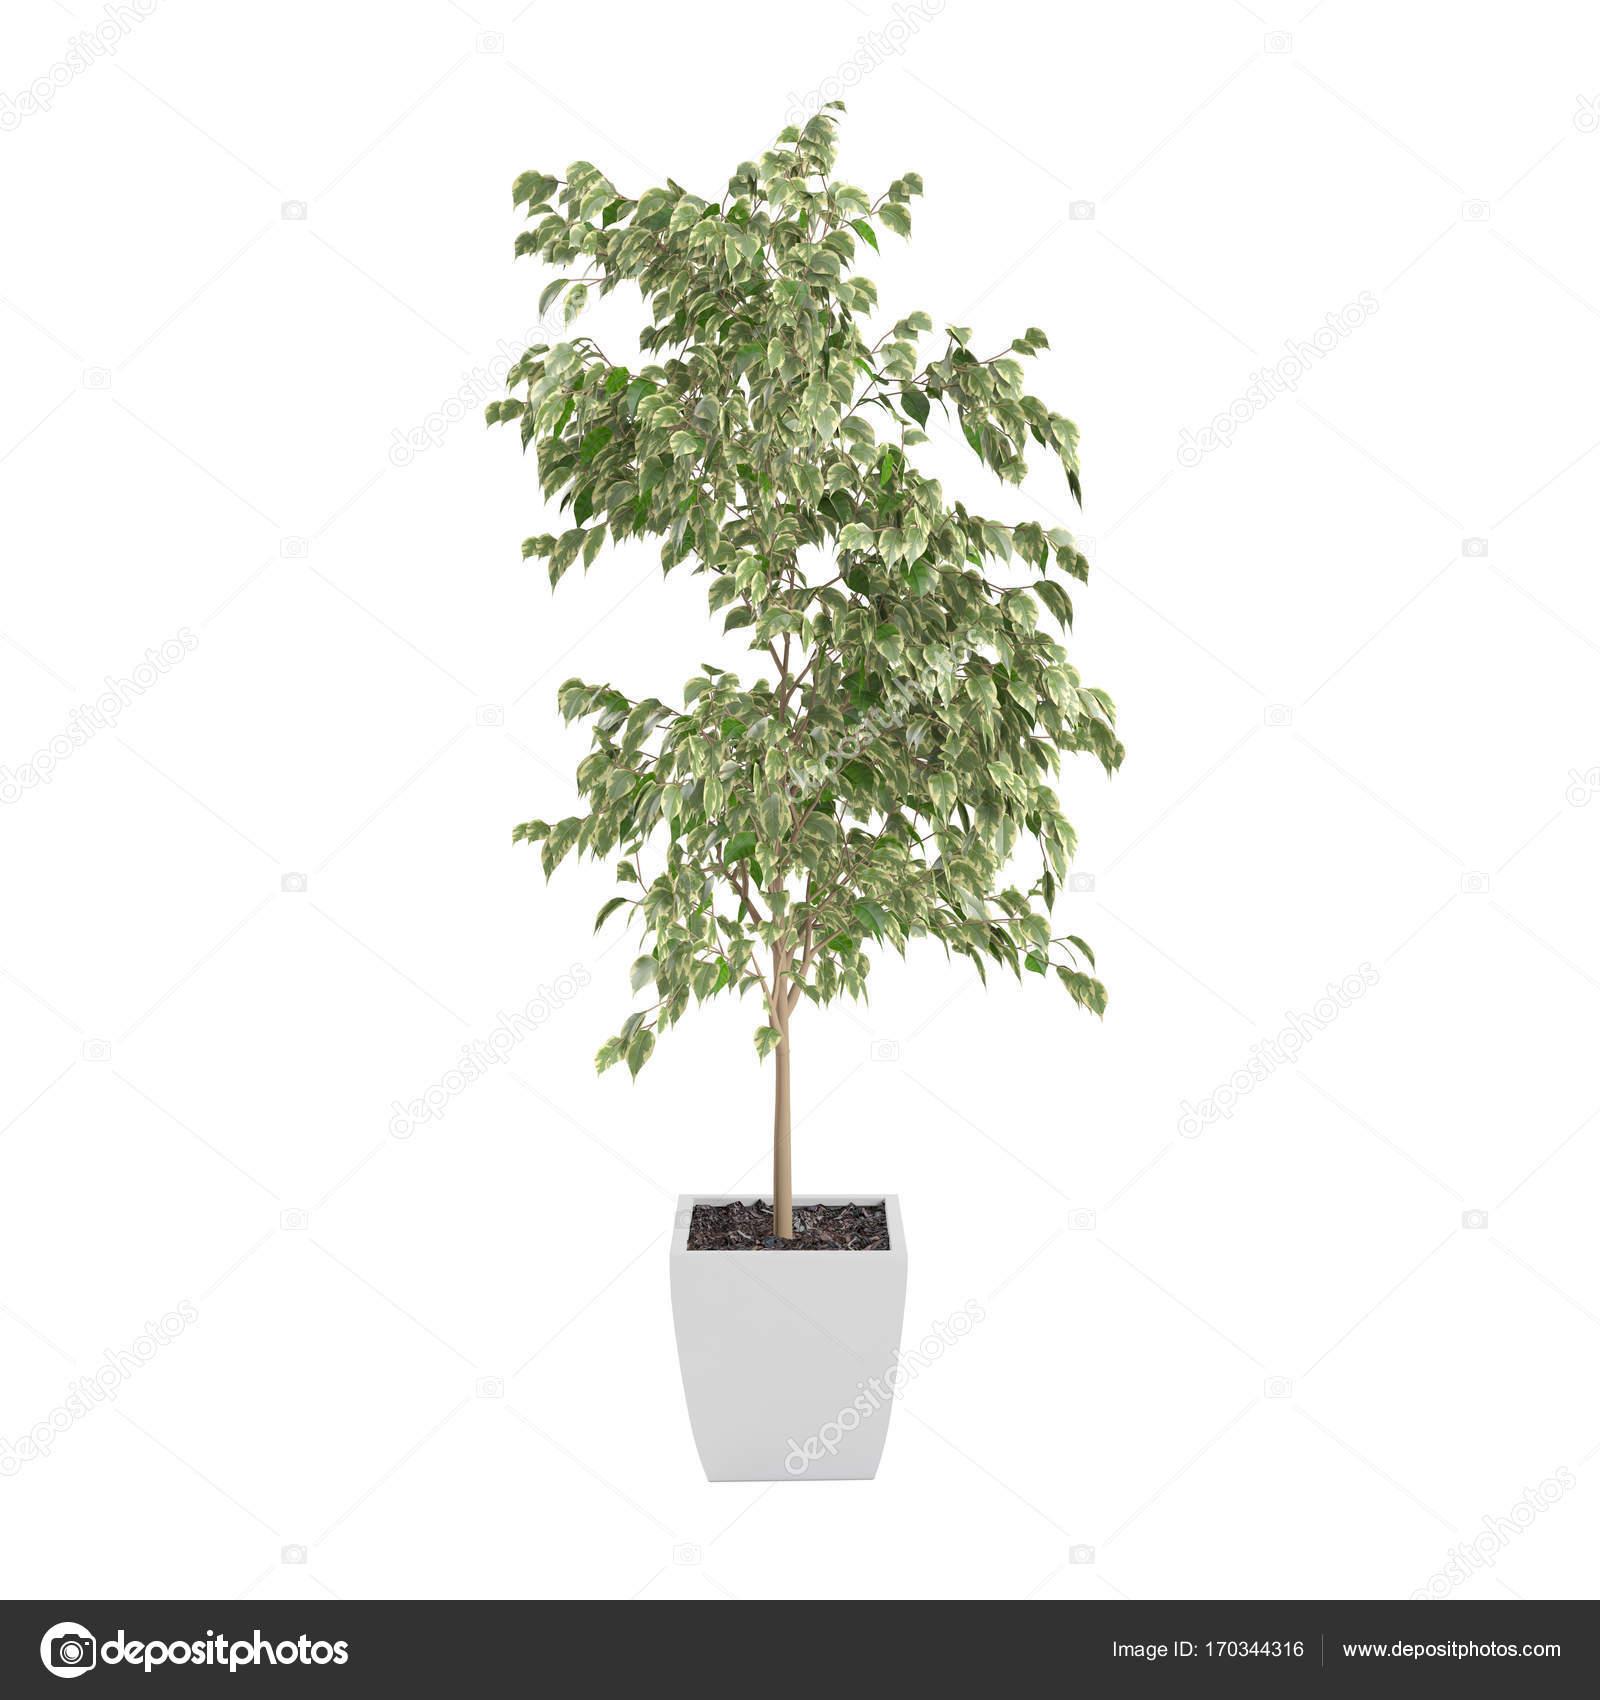 arbre décoratif de ficus benjamina — photographie vahekatrjyan